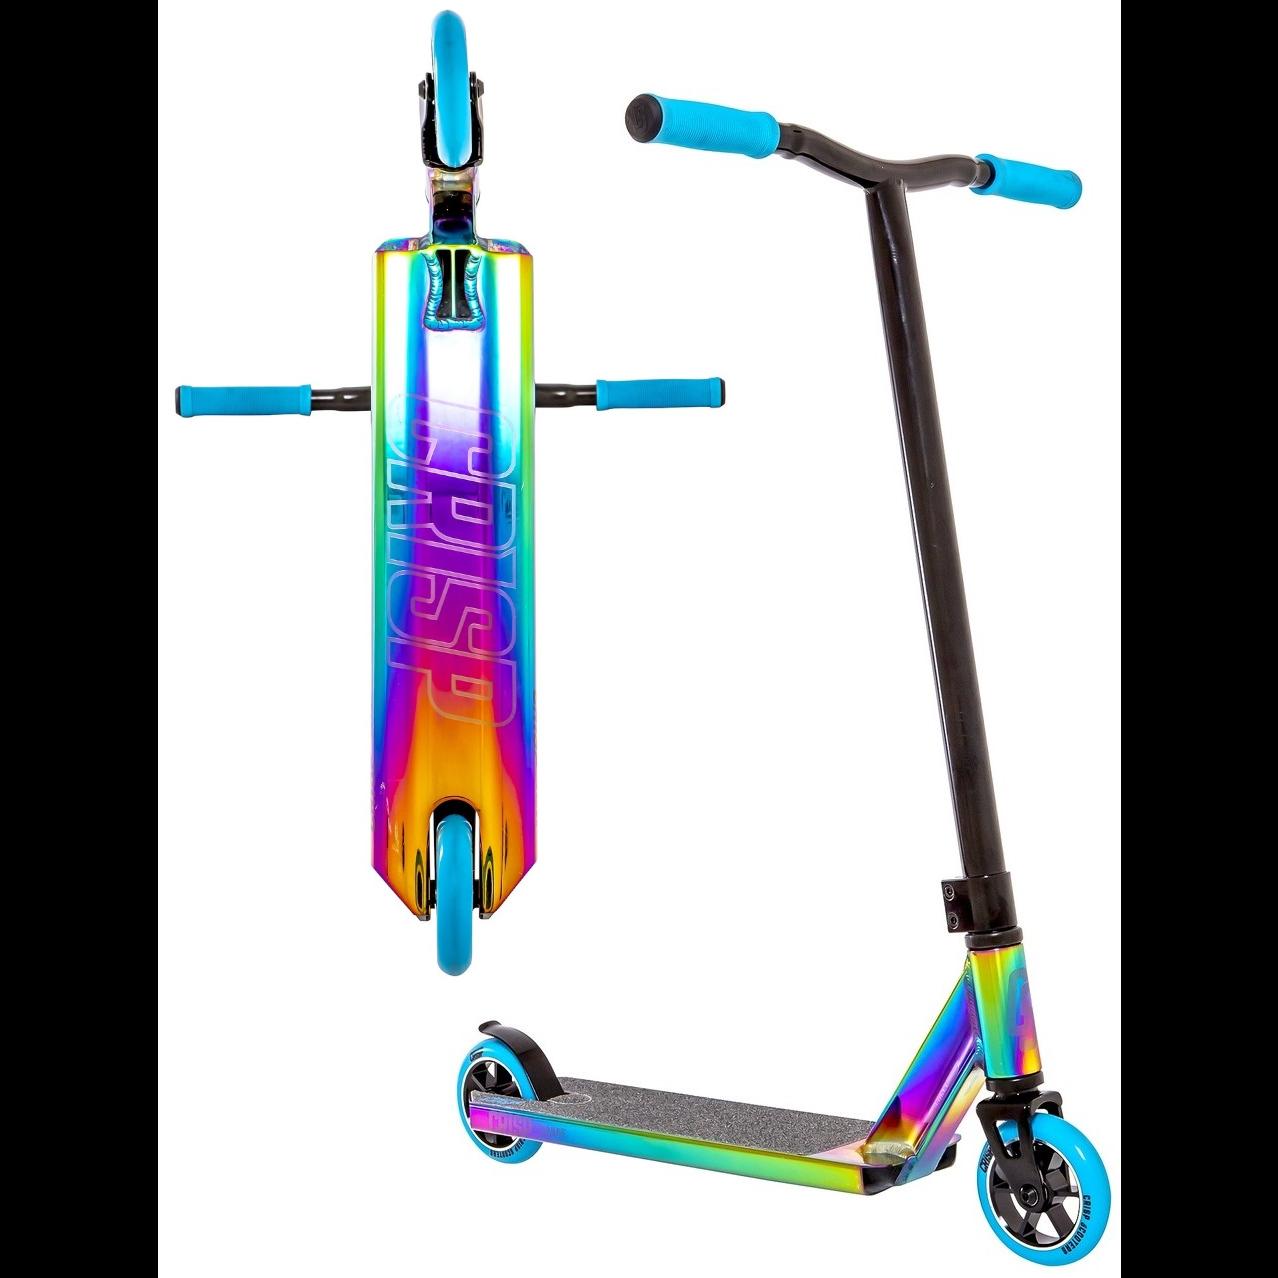 Crisp Surge 20 Complete Stunt Scooter   Neochrome Oil Slick / Blue